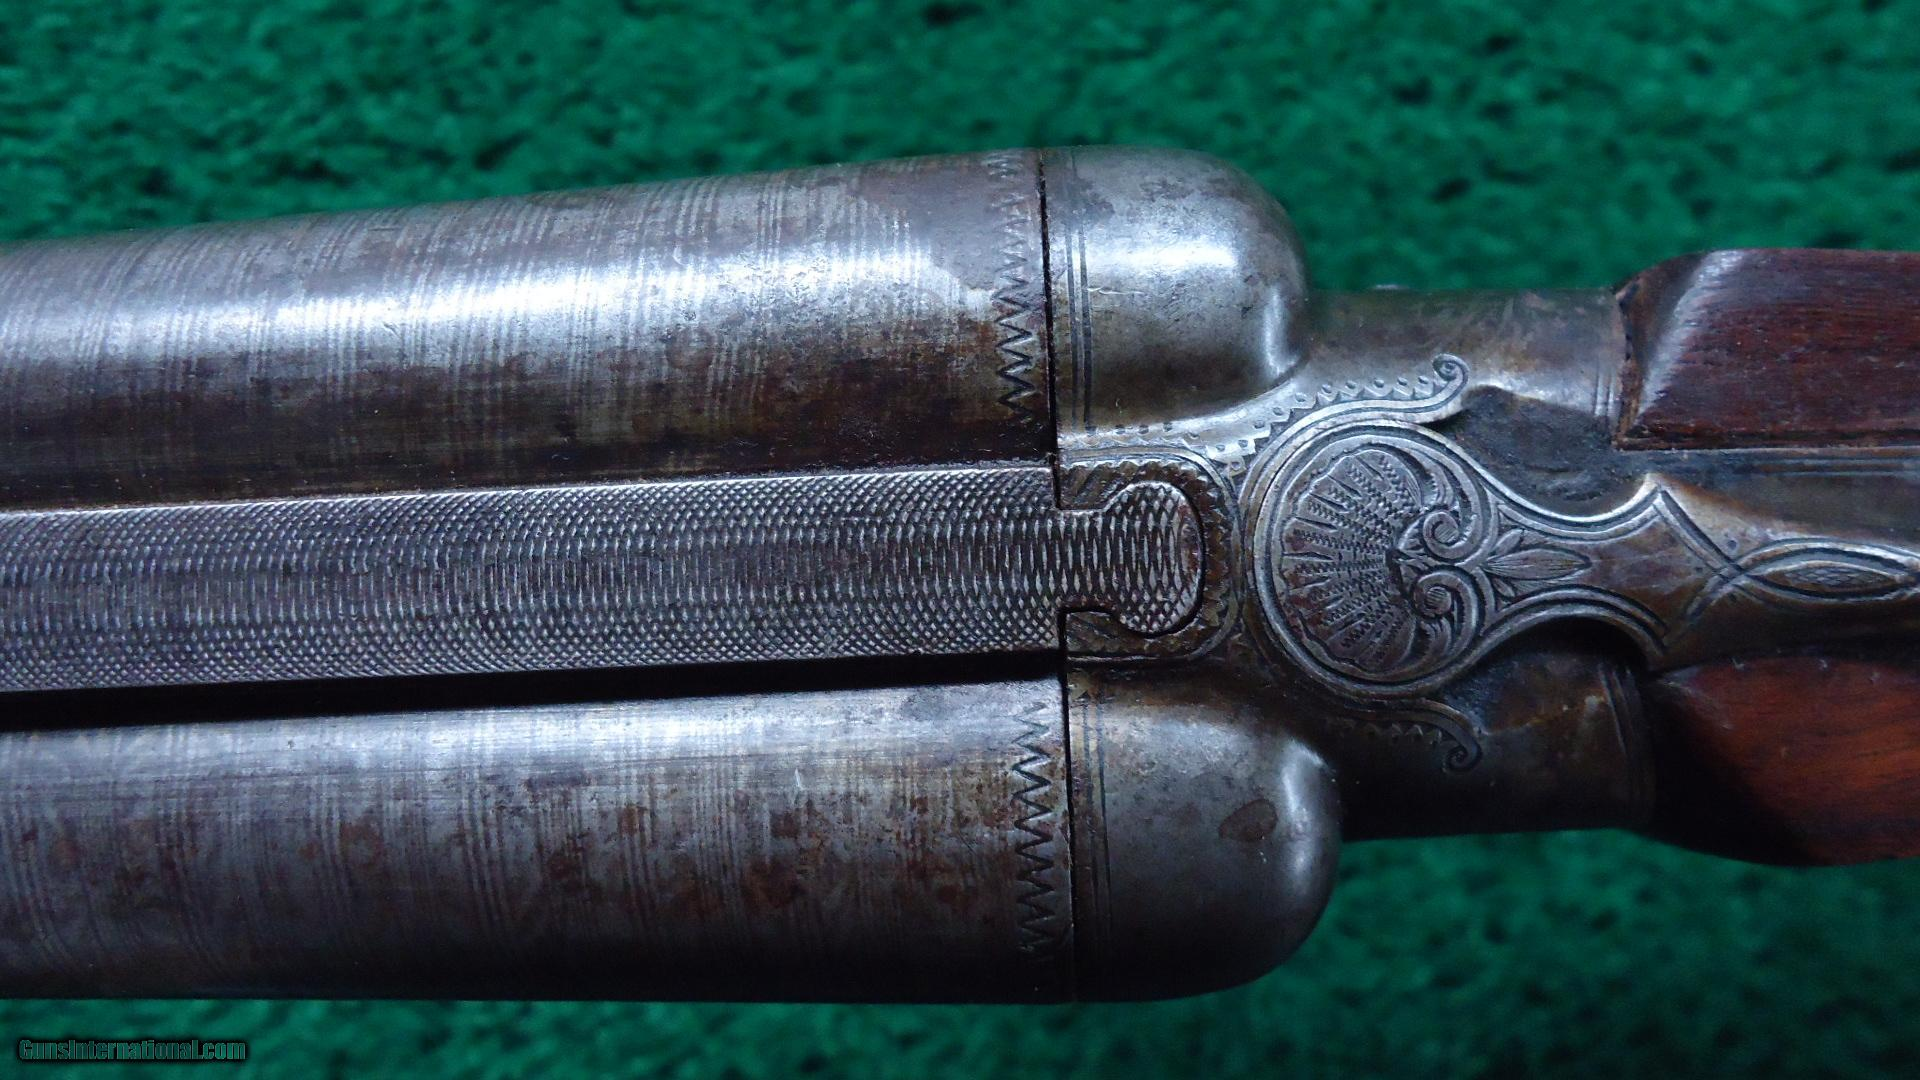 Antique Ithaca Shotguns – Wonderful Image Gallery